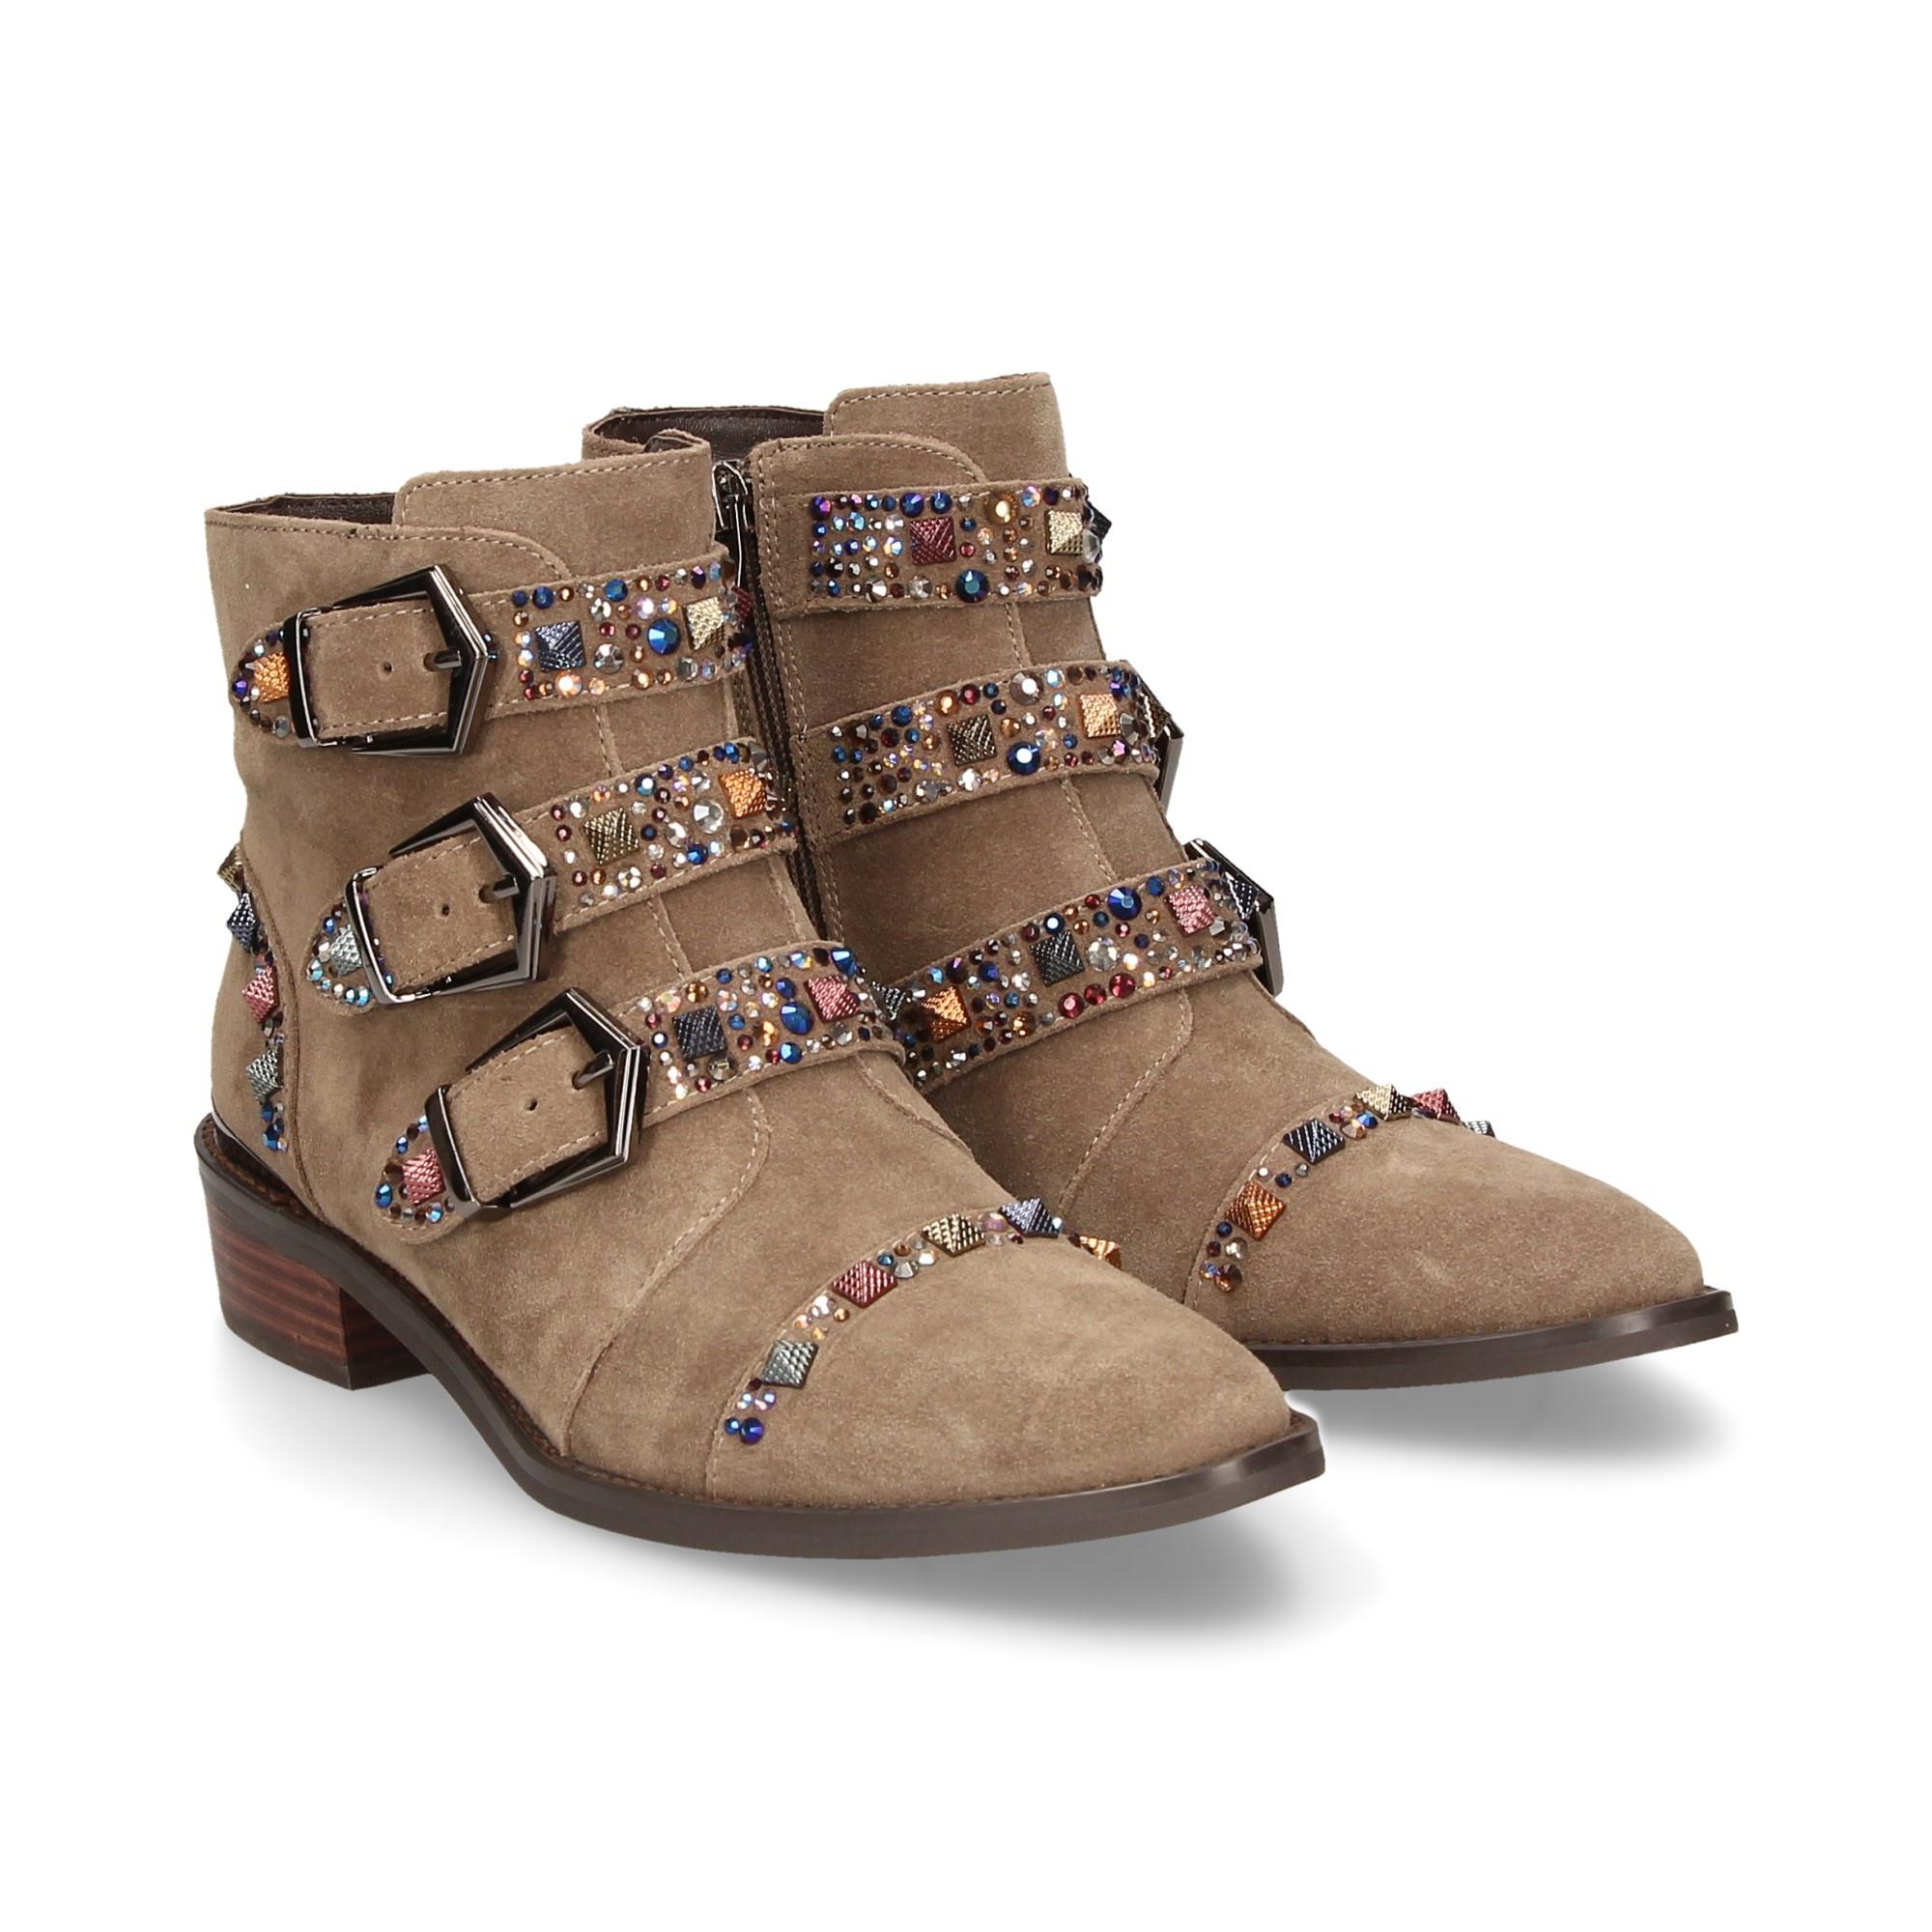 Óxido clase consumirse  ALMA EN PENA Women's flat ankle boots 262 TAUPE